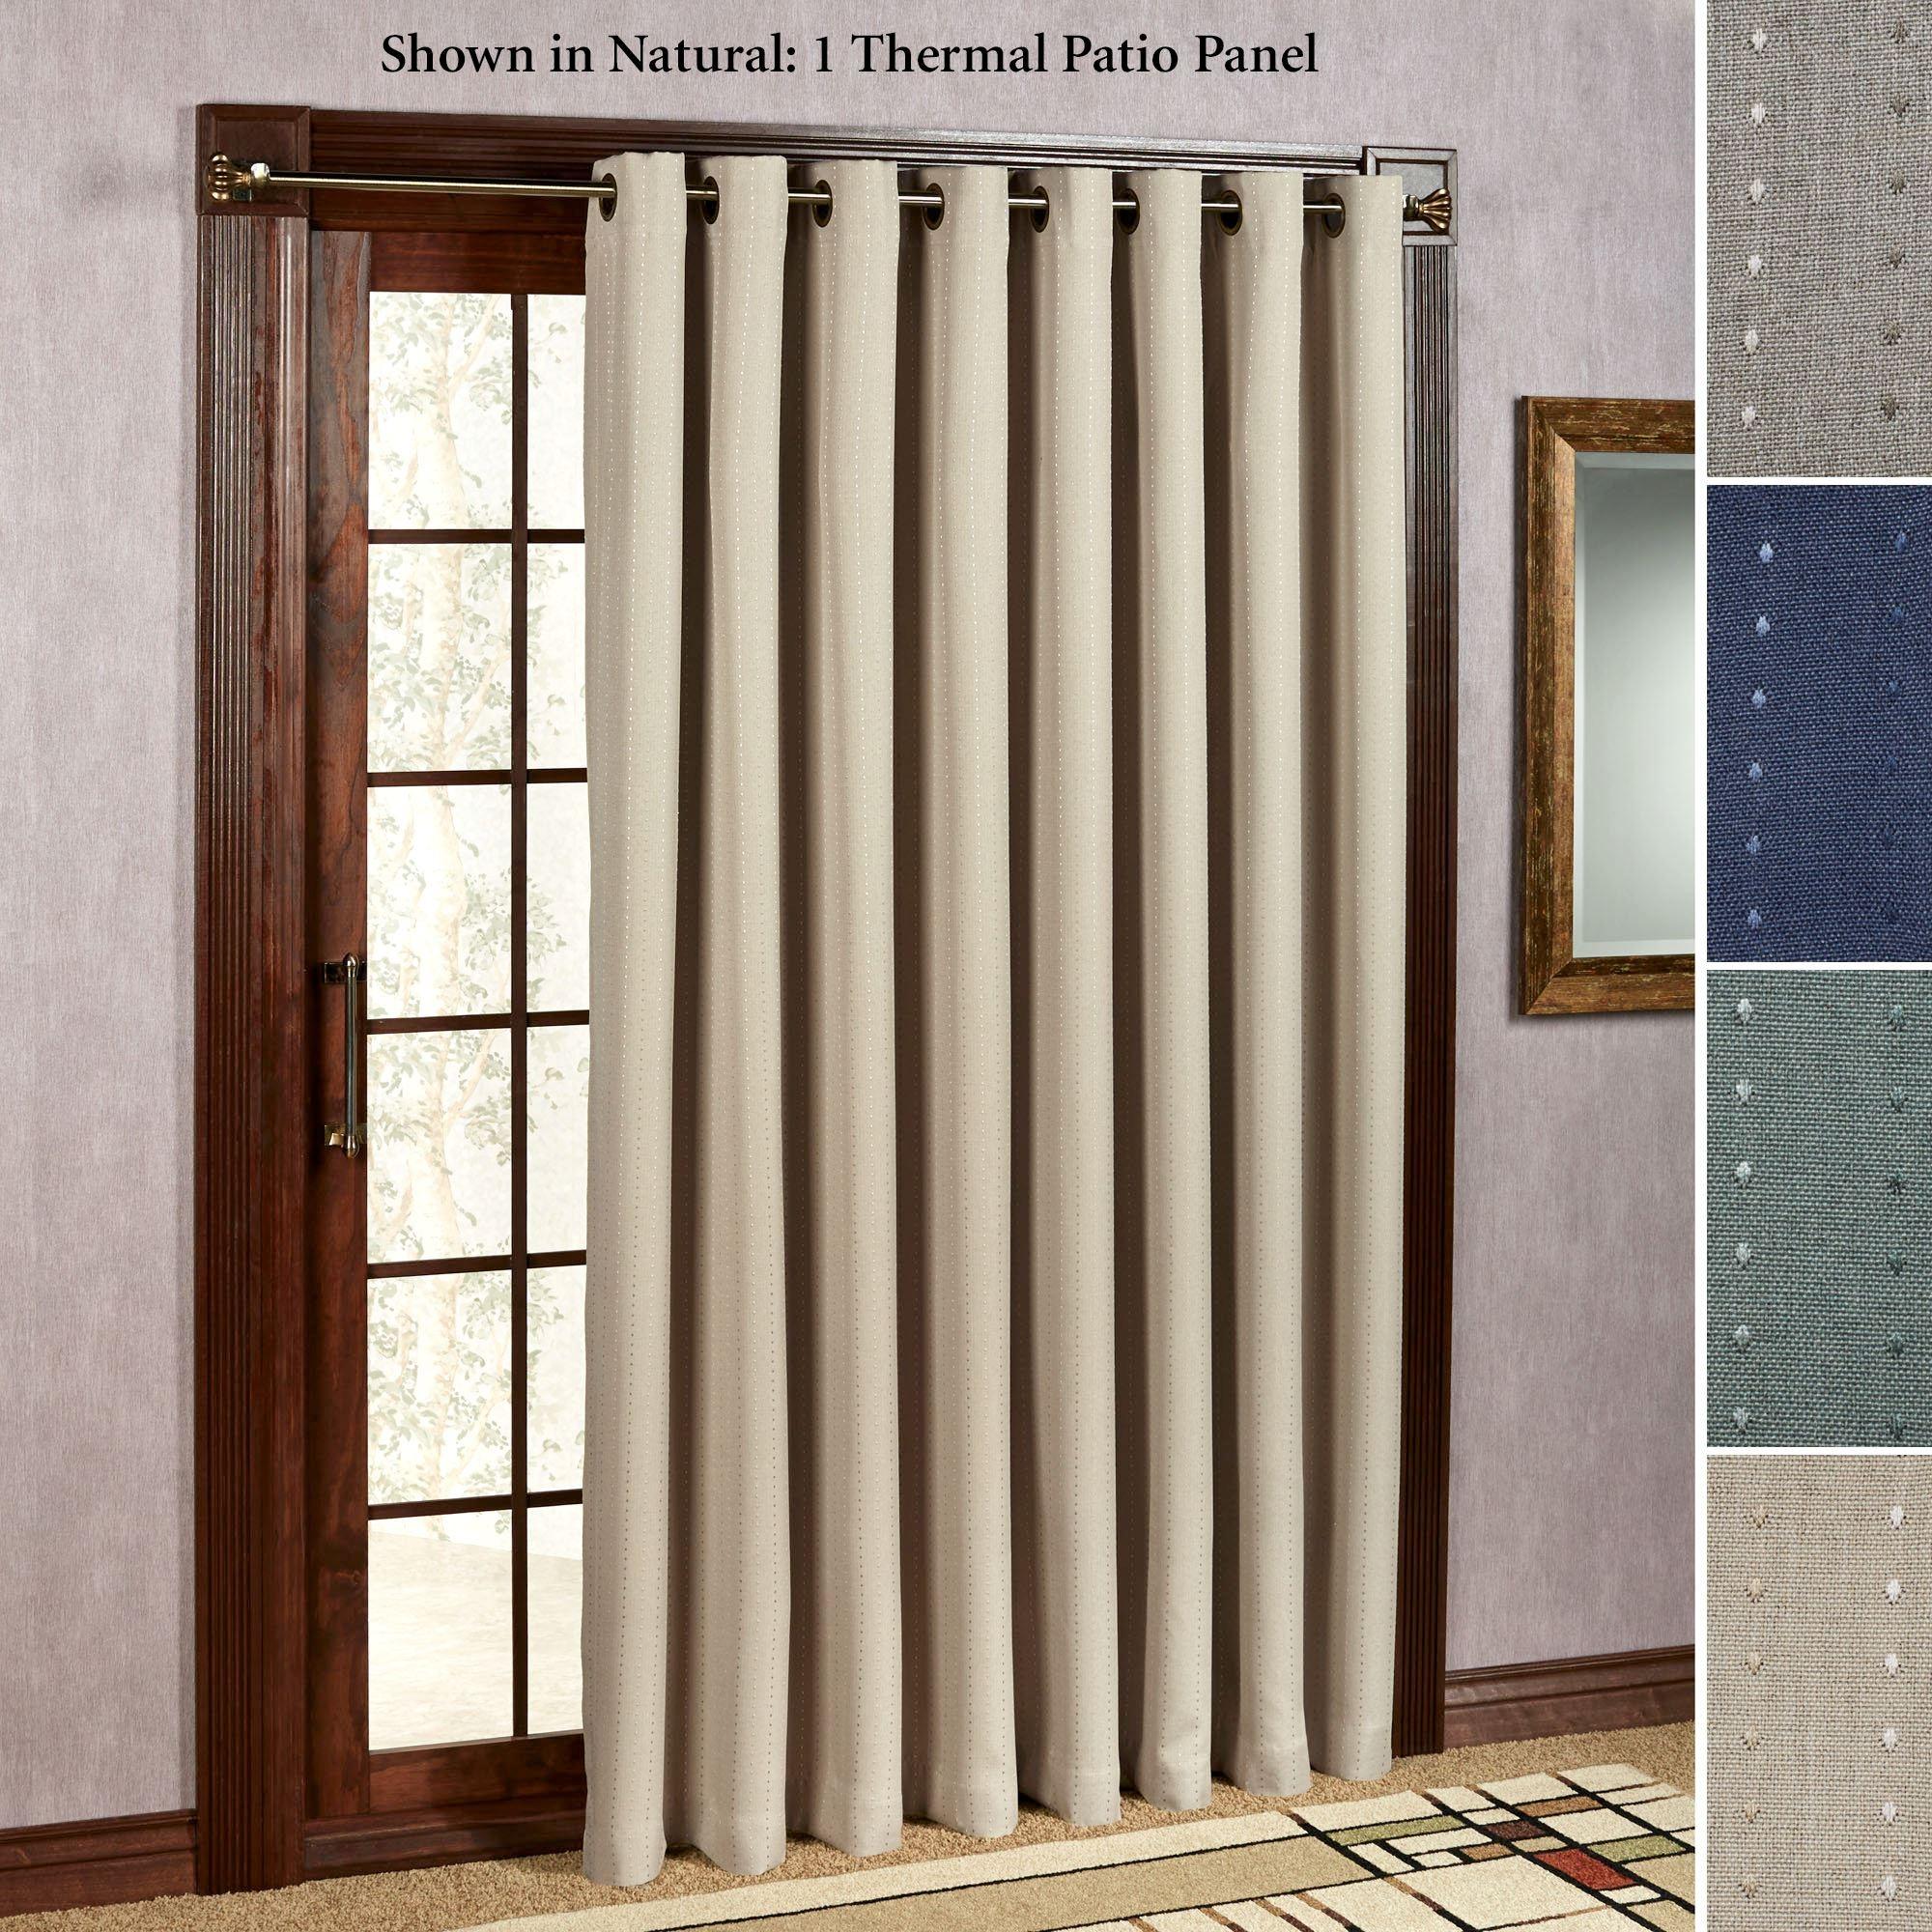 Sliding Glass Door Drapespatio door curtain panels touch of class